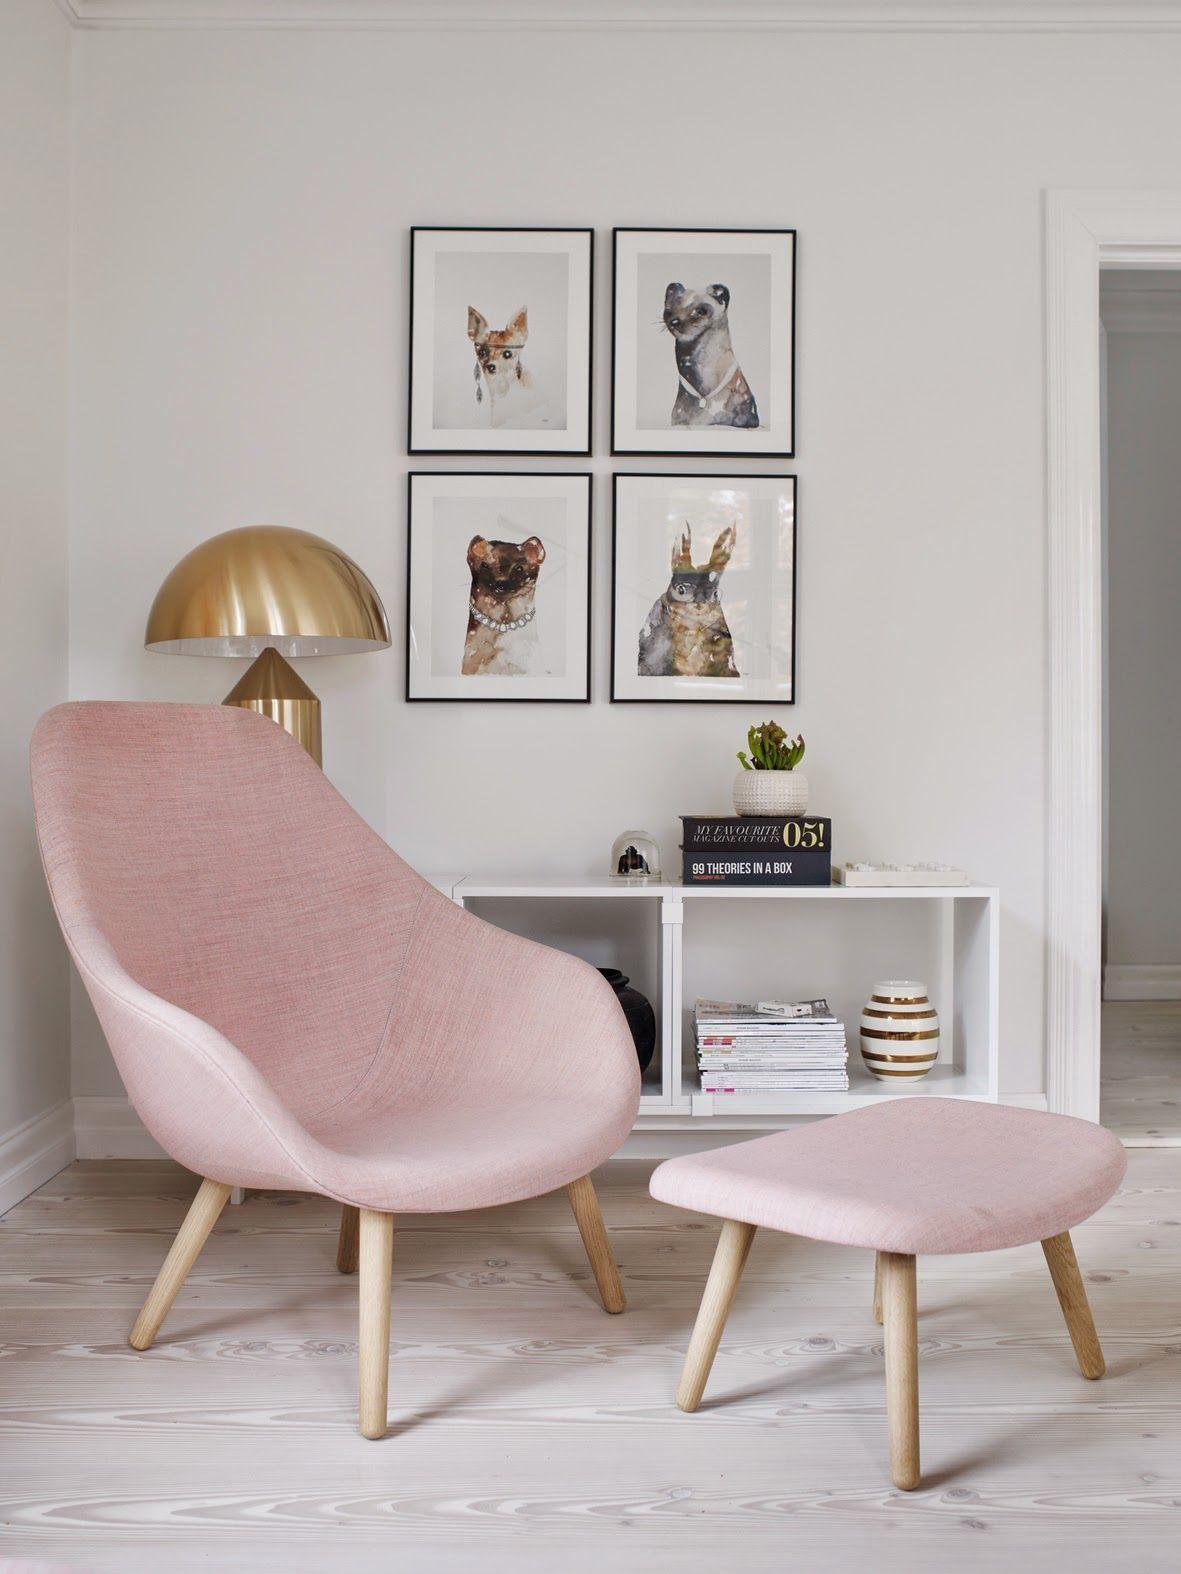 Bedroom Chair Pinterest Padded Rocking Cozy Reading Nook Cadeiras E Sofás